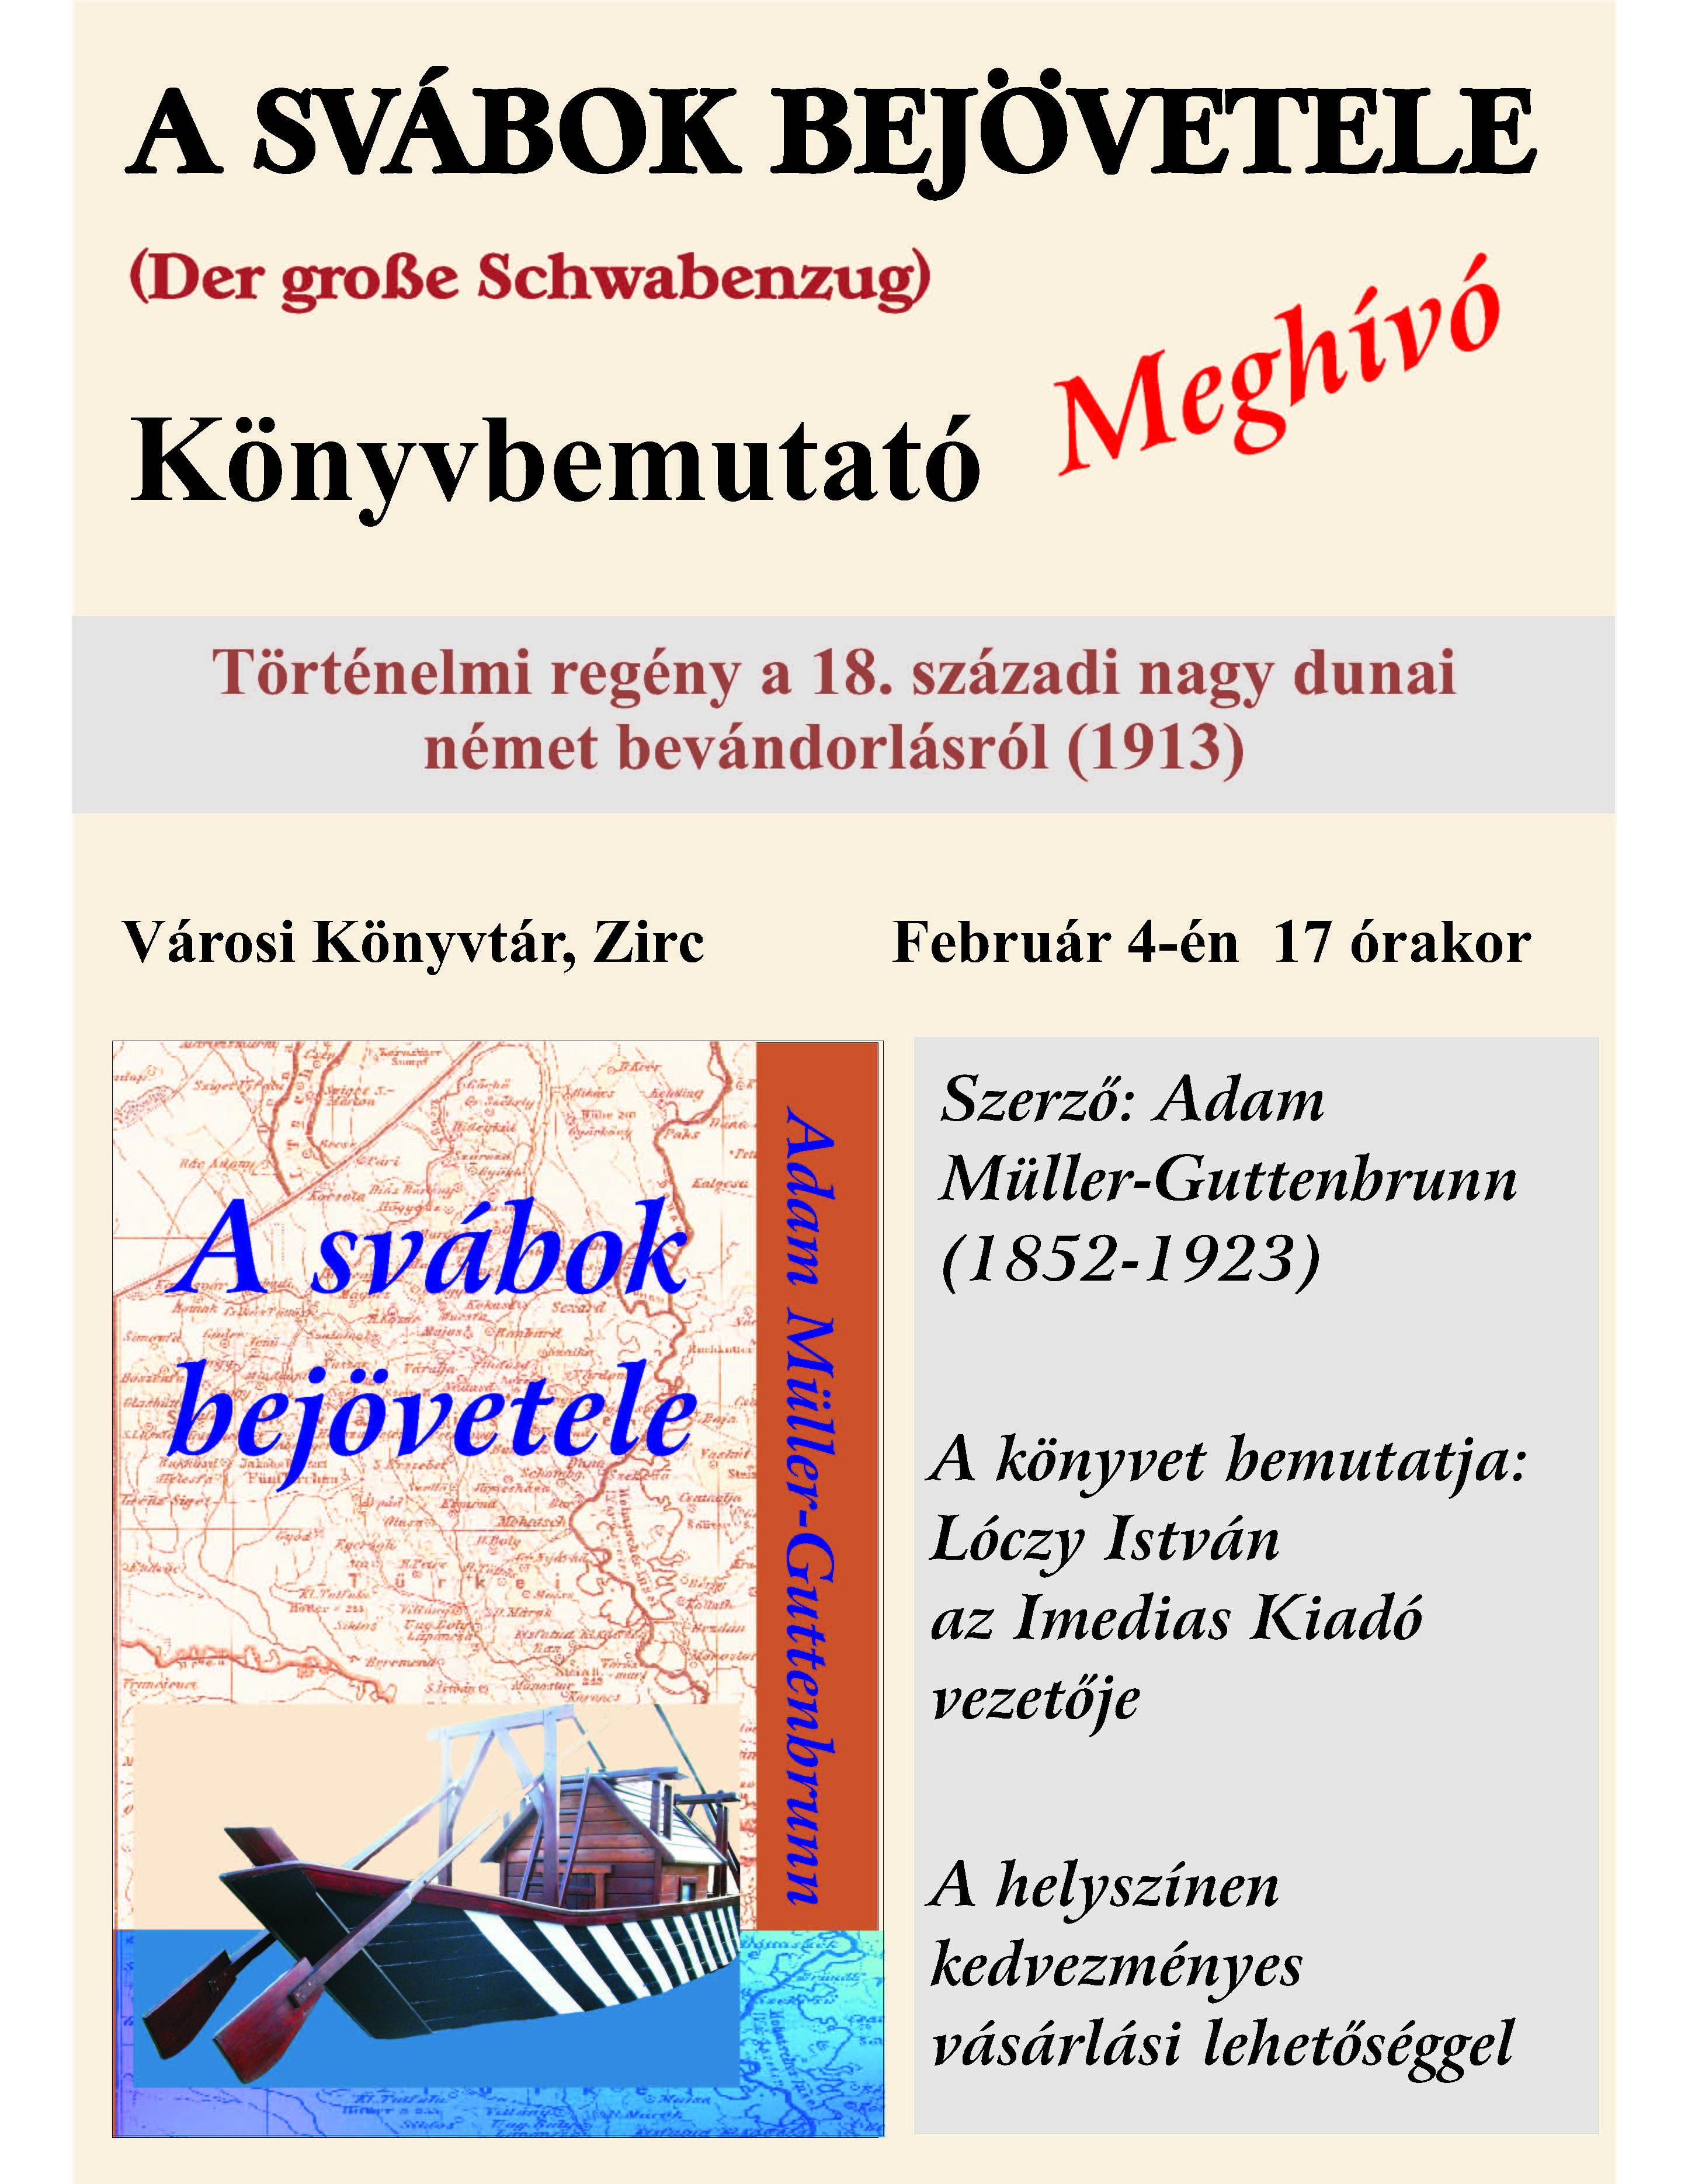 2016-02-04_a_svabok_bejovetele_c_konyv_bemutatoja.jpg